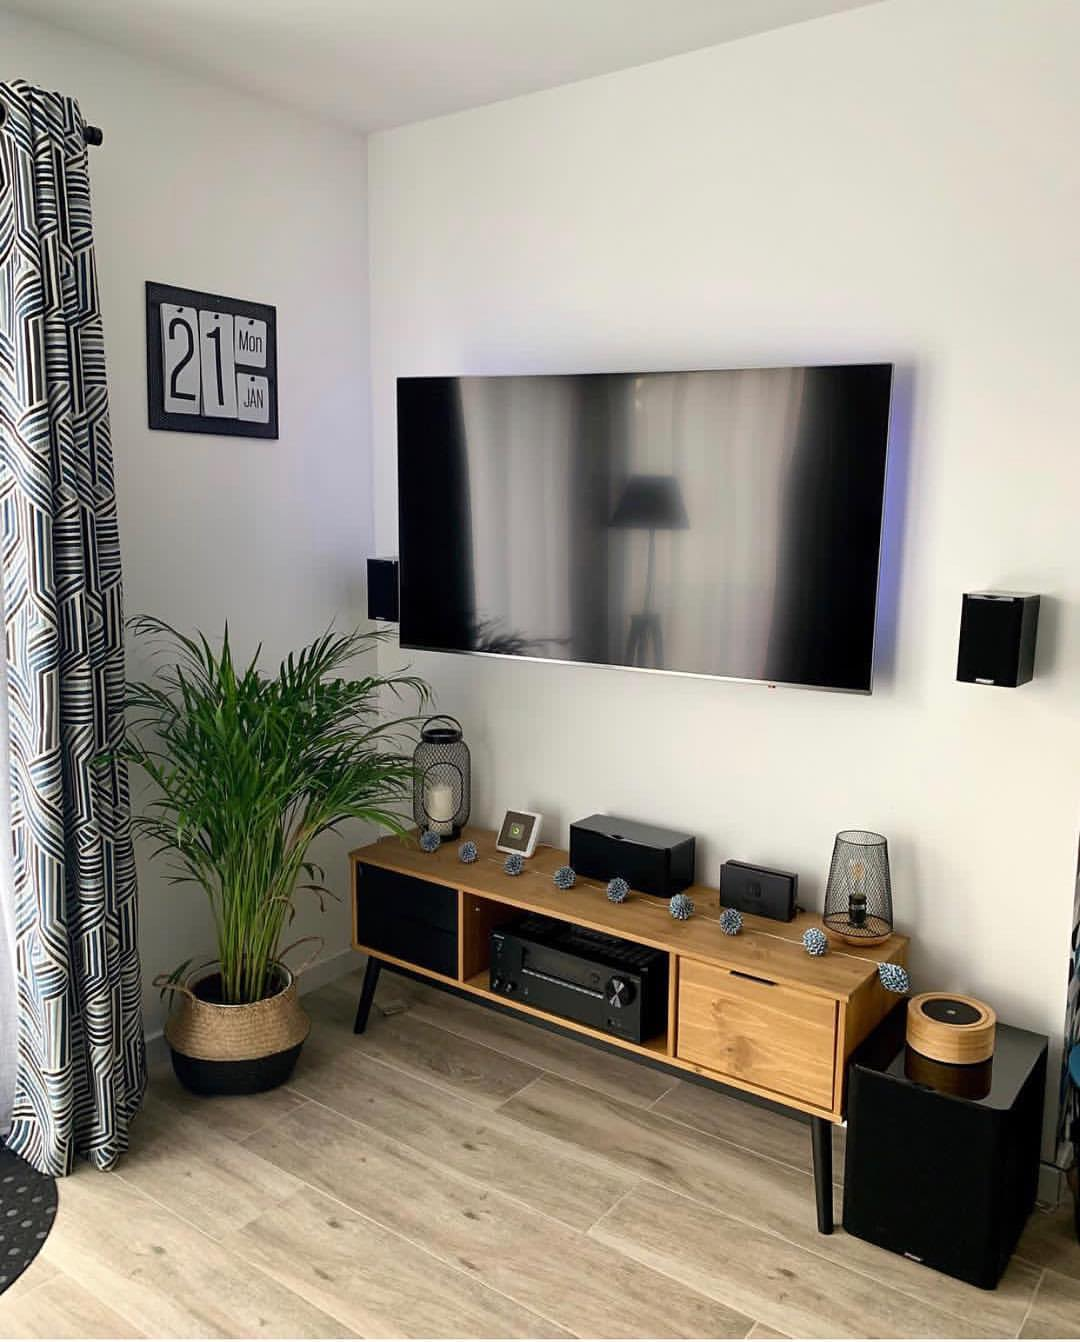 Ikea meuble tv blanc et bois